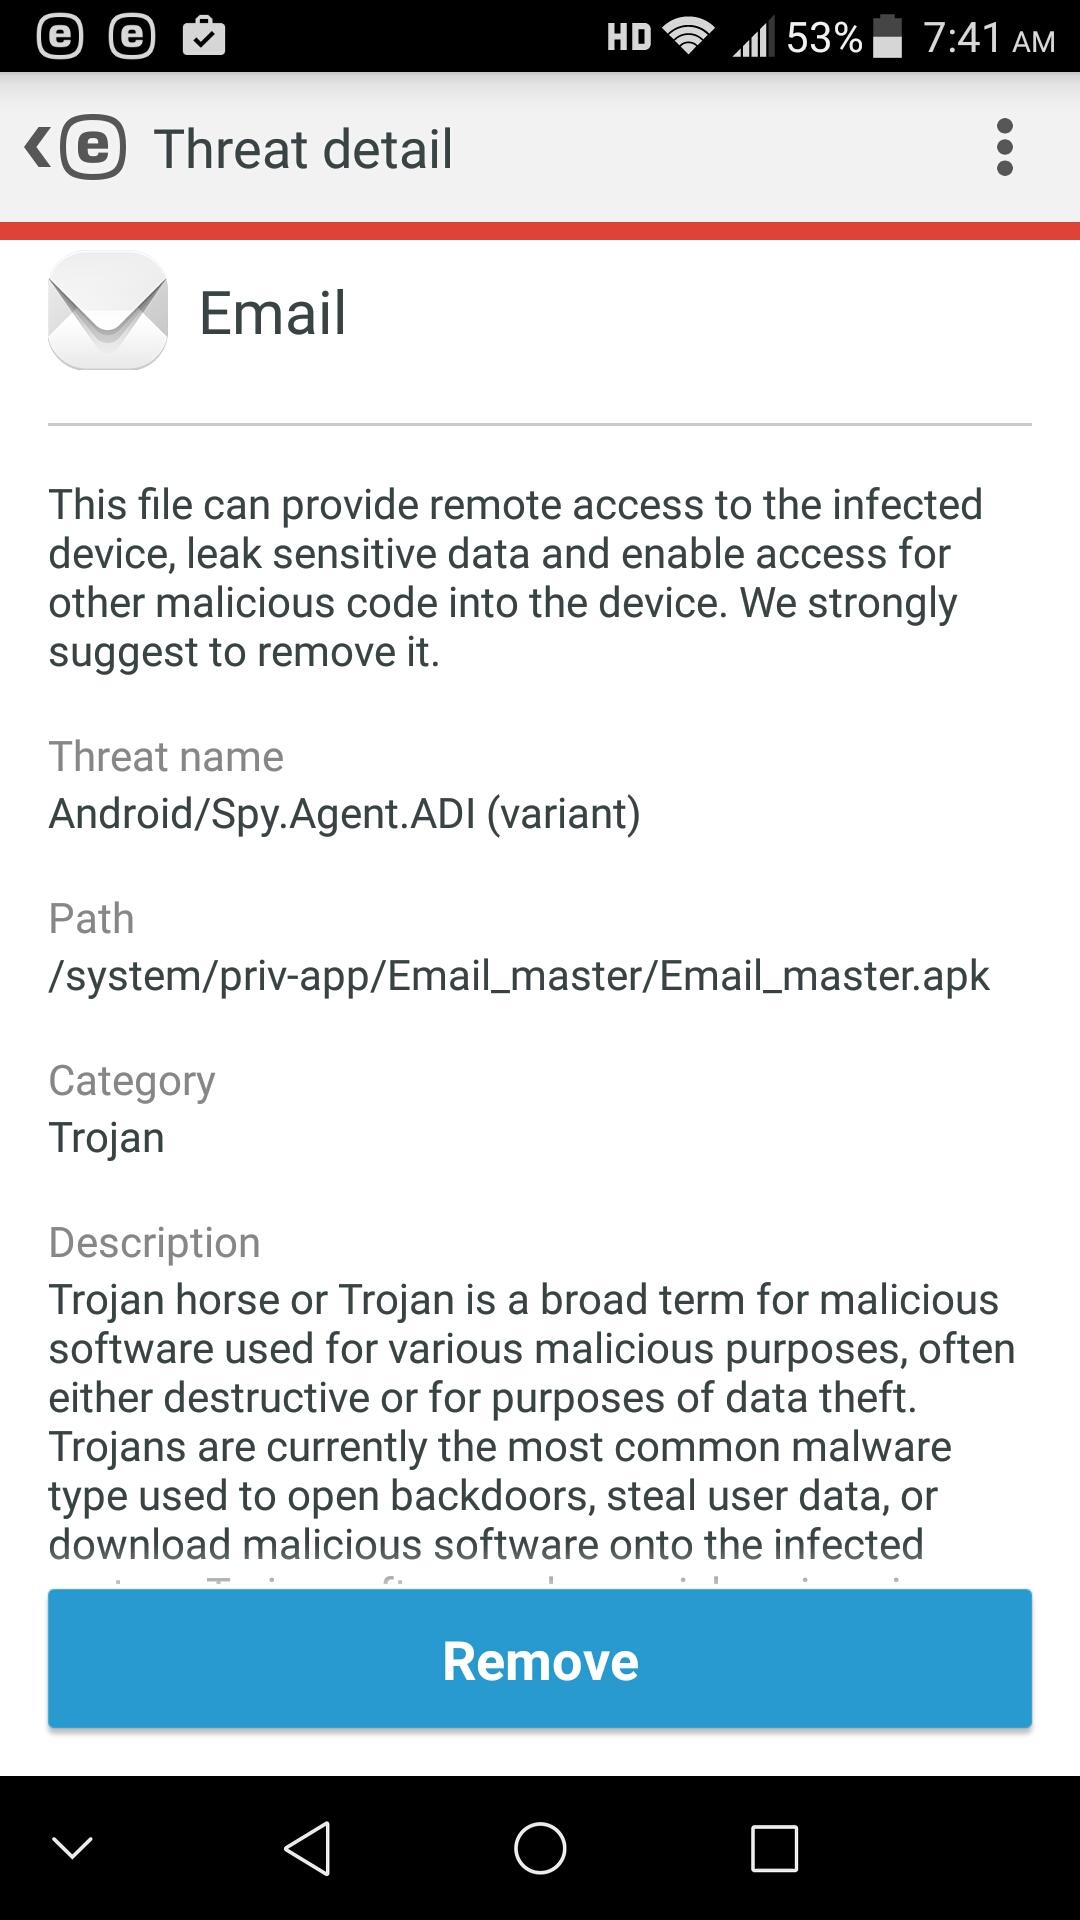 Default Email APK Spy Agent? — Z-Community